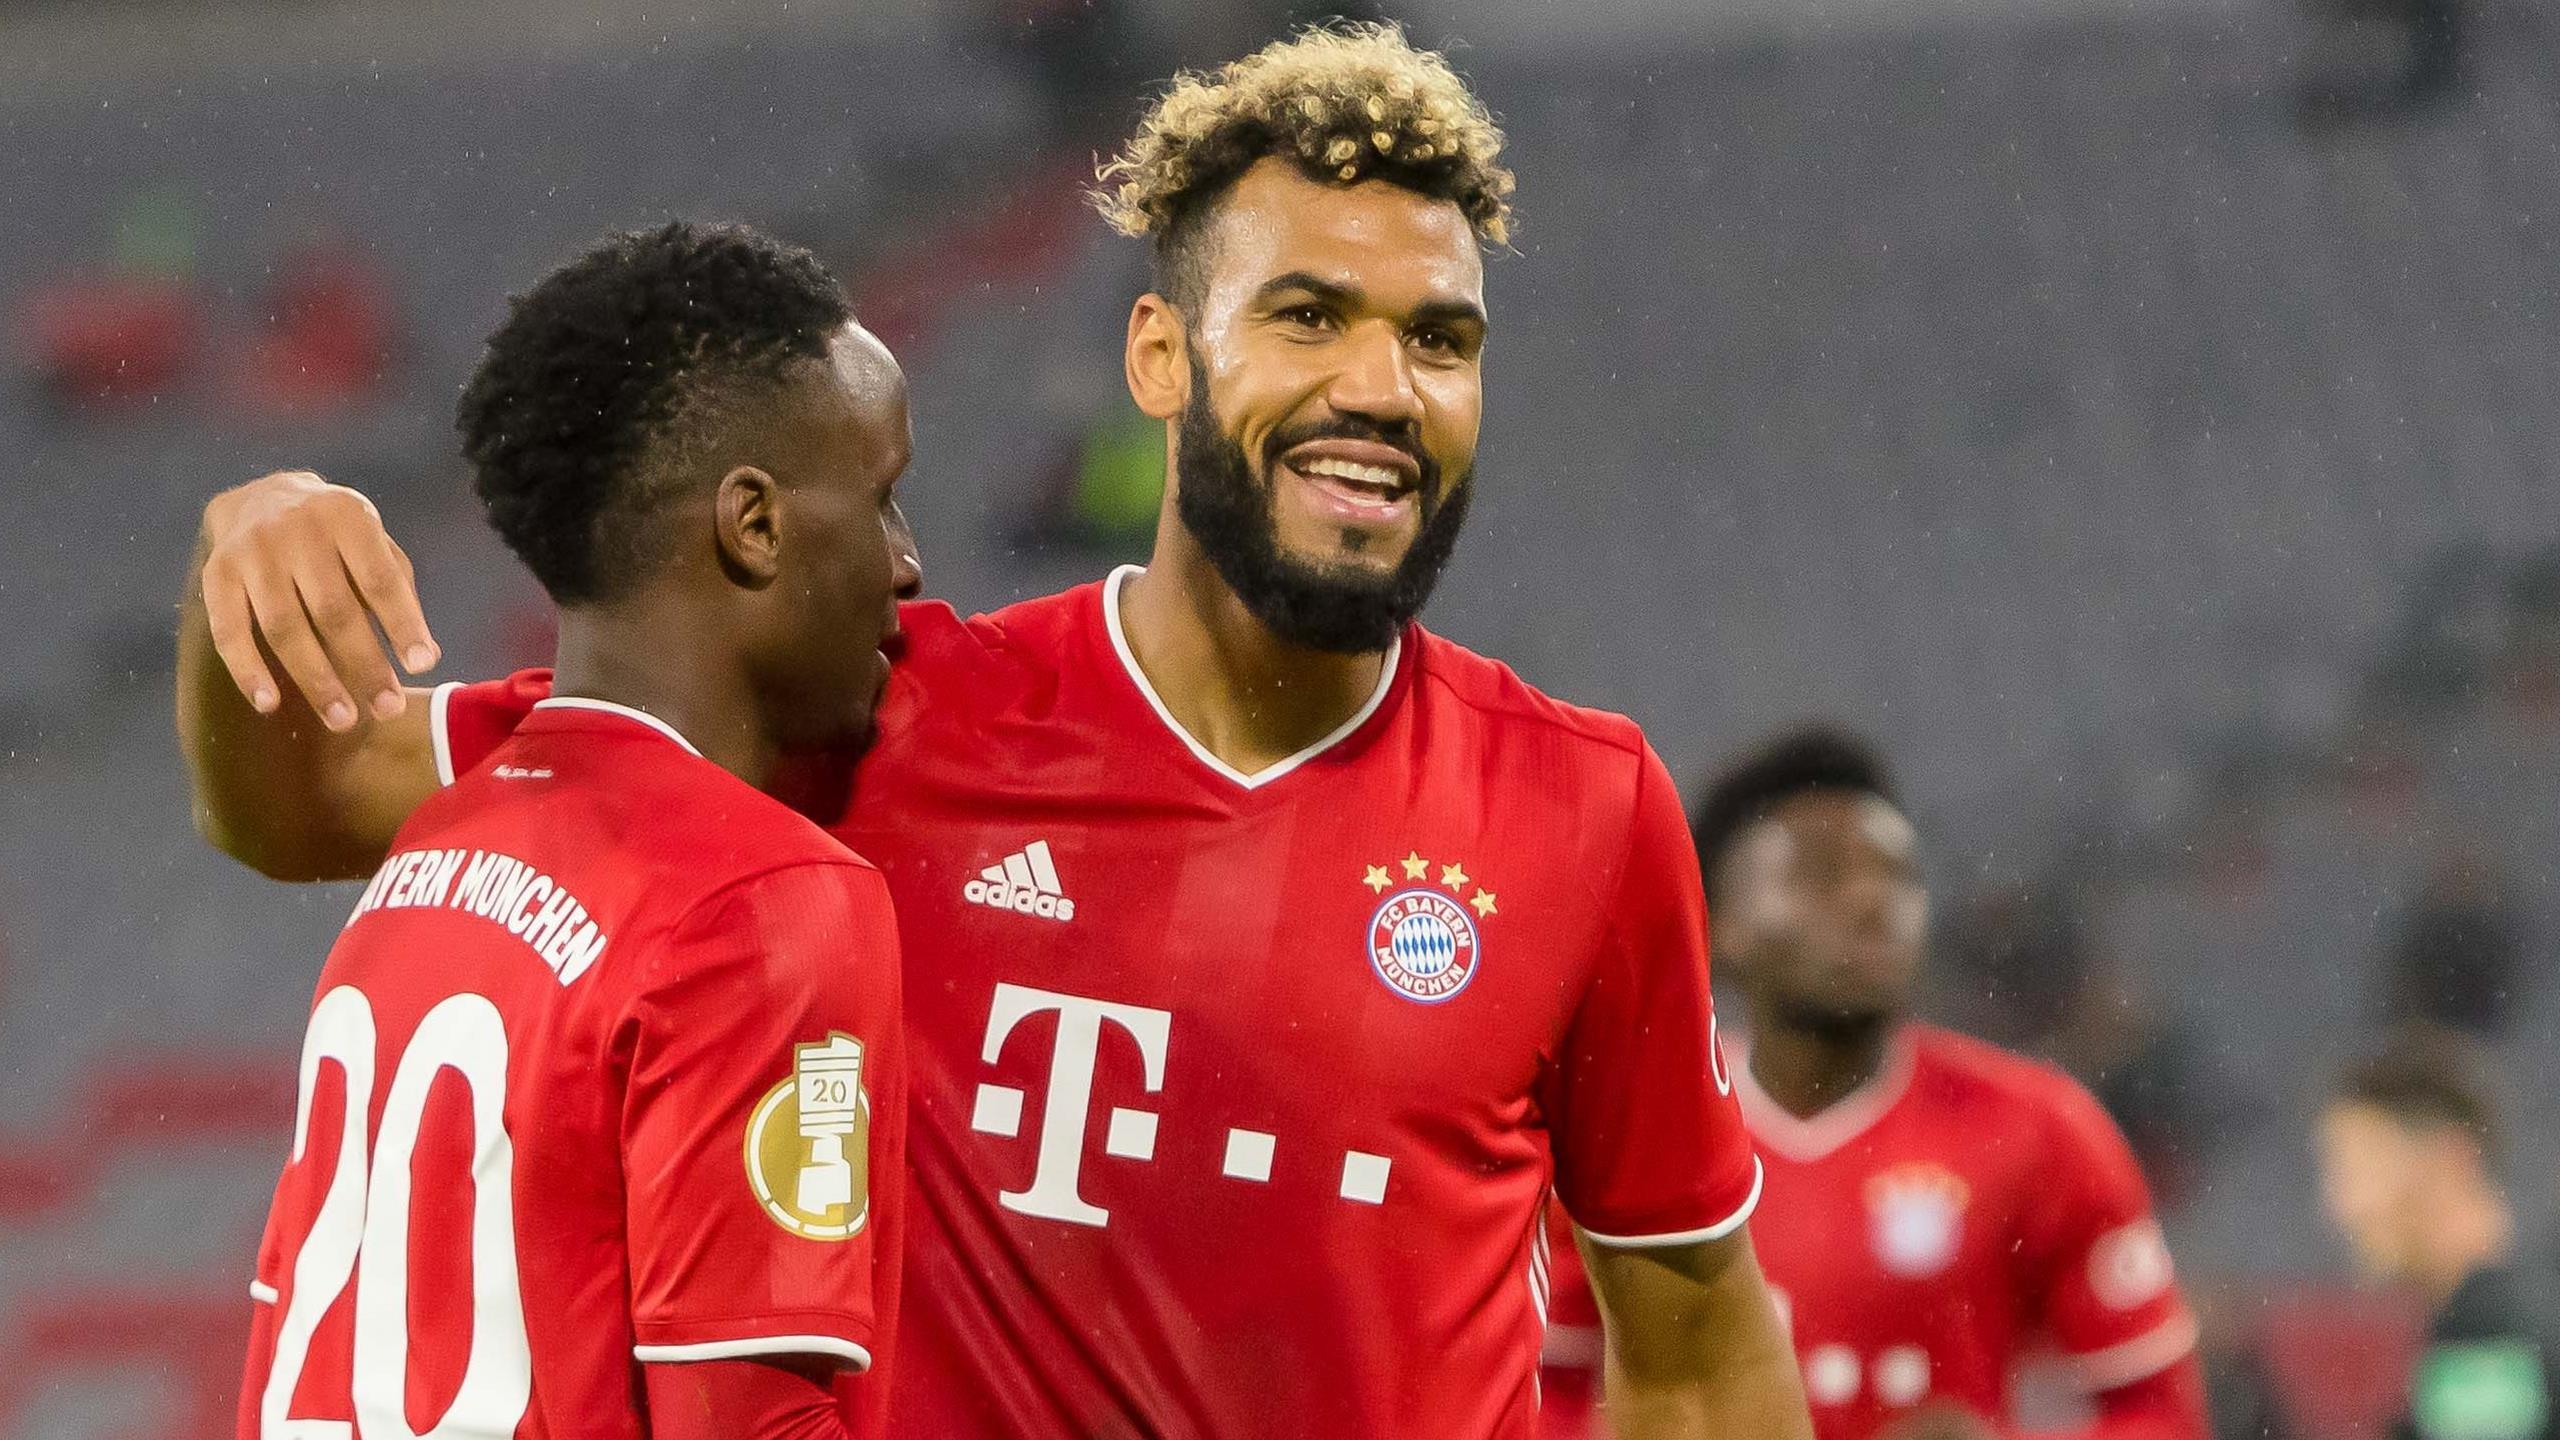 Eric Maxim Choupo-Moting scores twice on Bayern Munich debut in German Cup  win - Eurosport